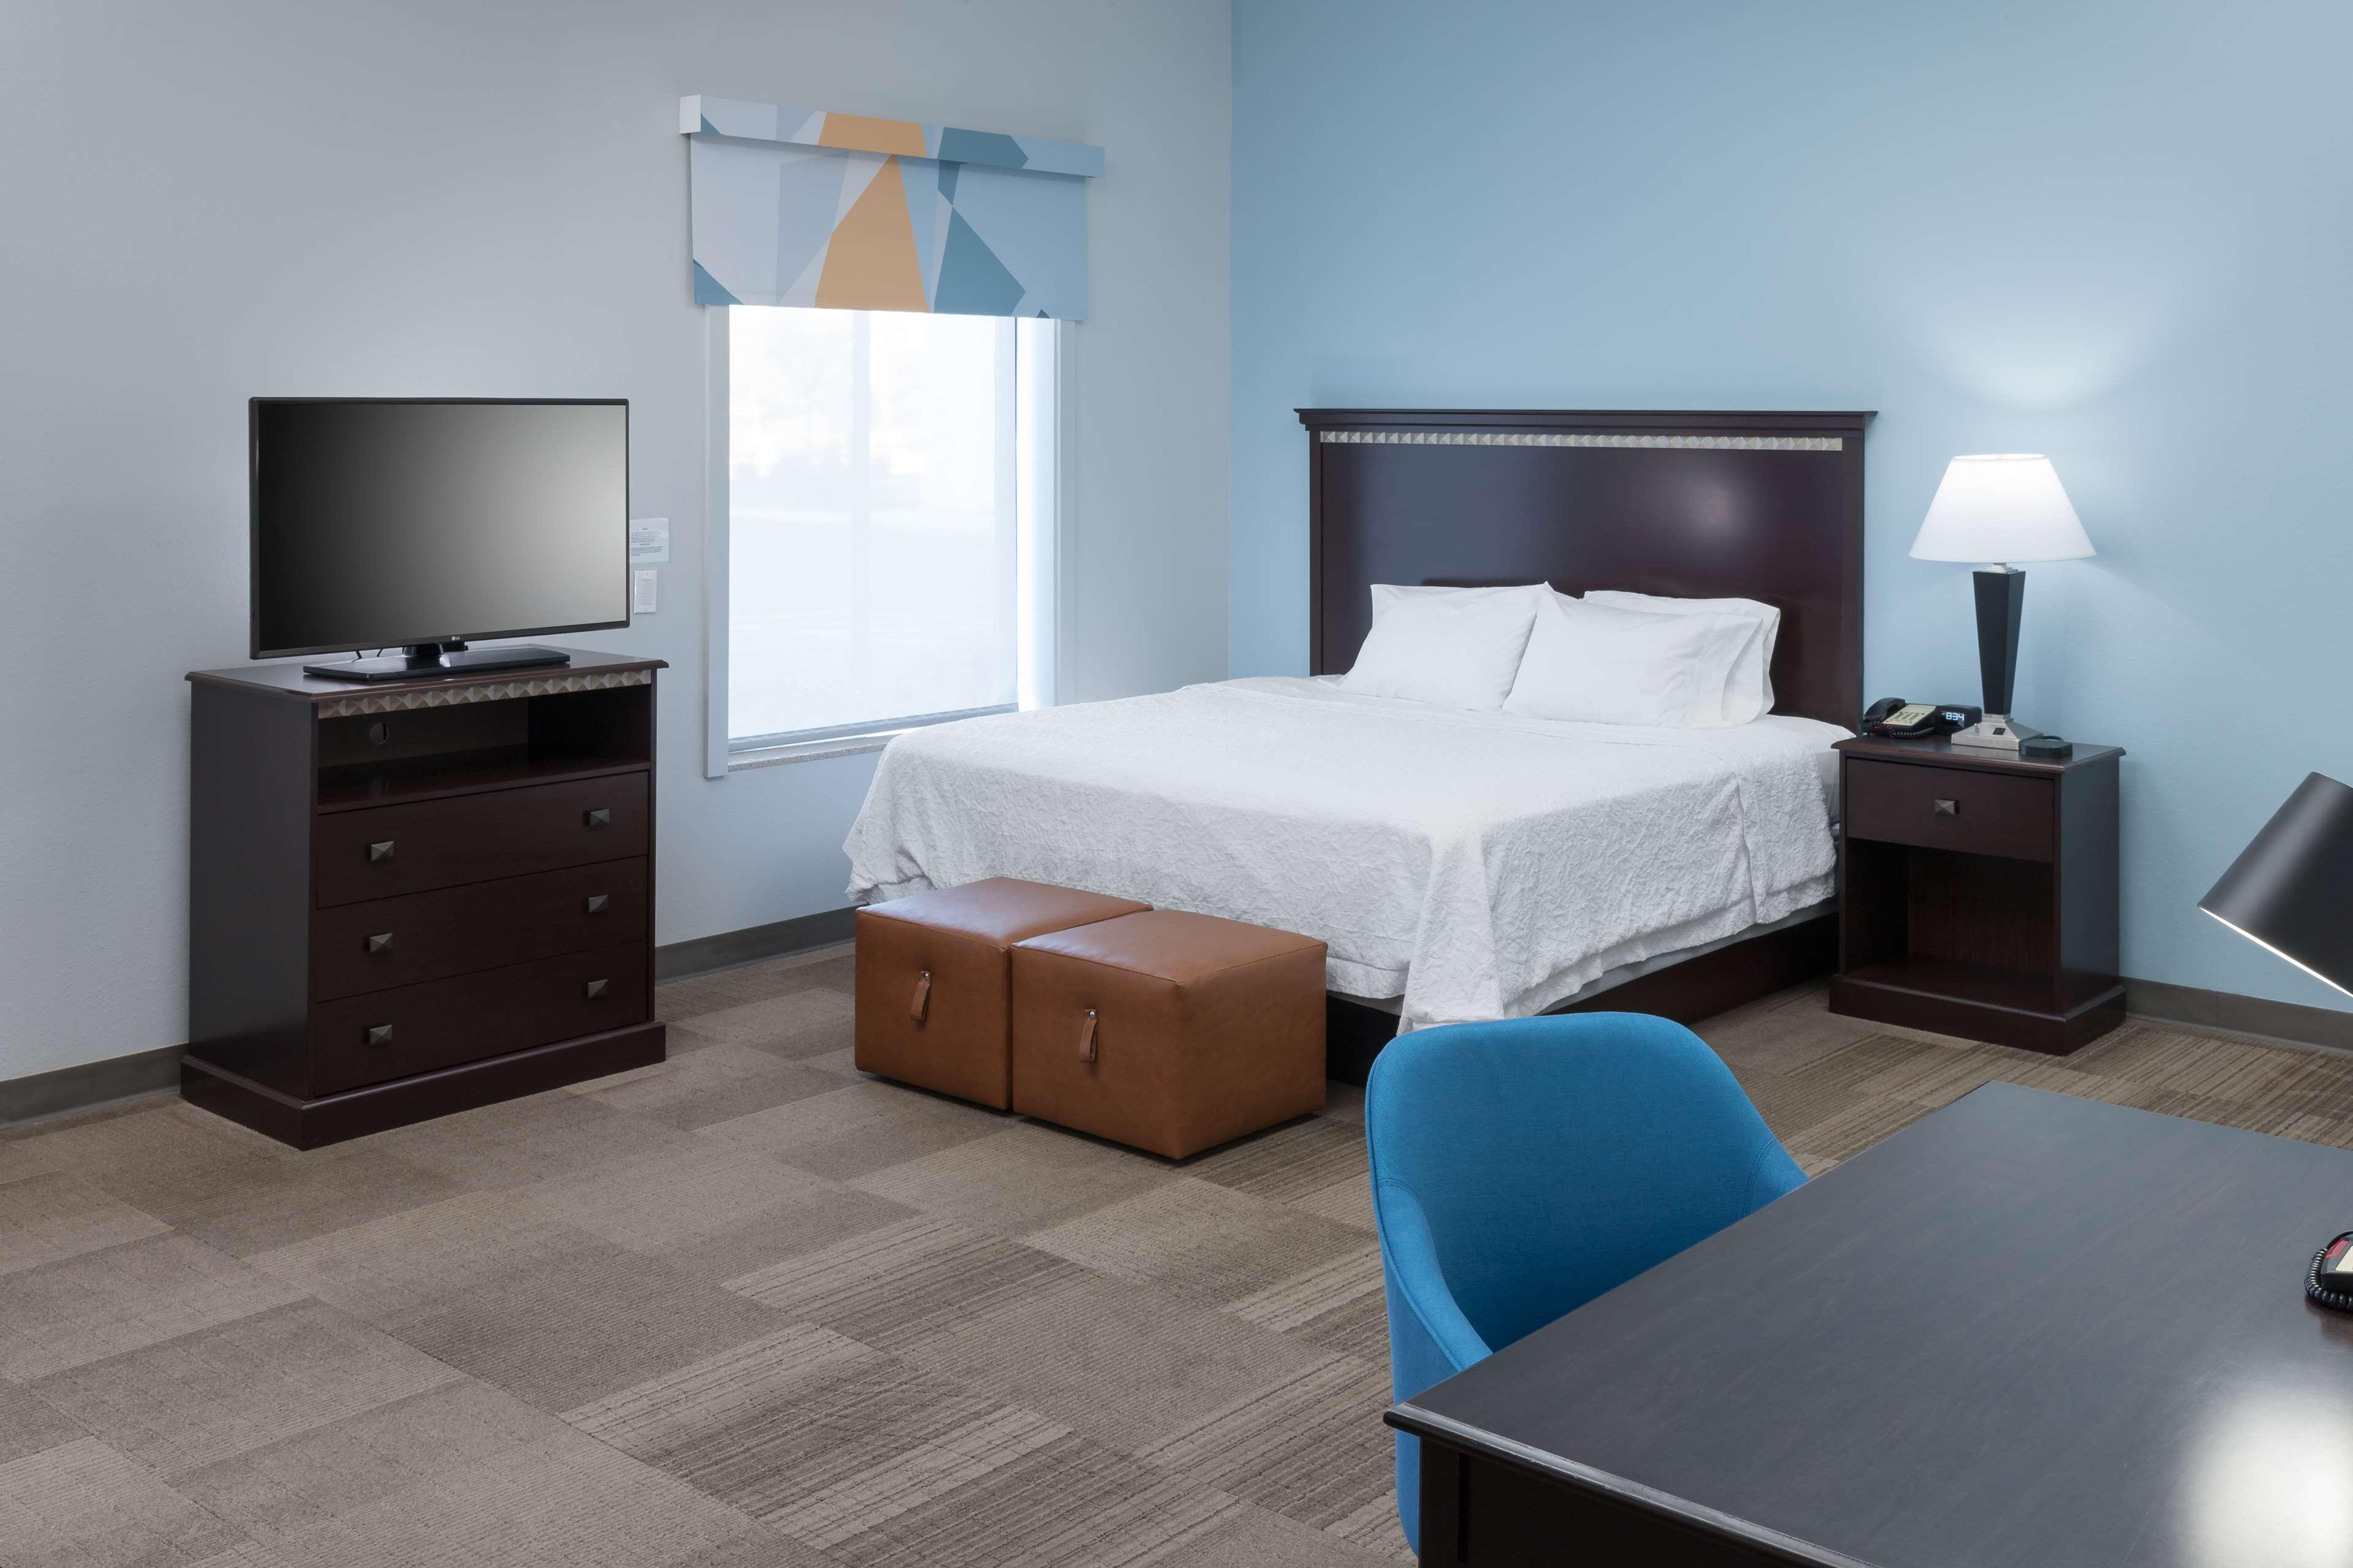 Hampton Inn & Suites Panama City Beach-Pier Park Area image 21